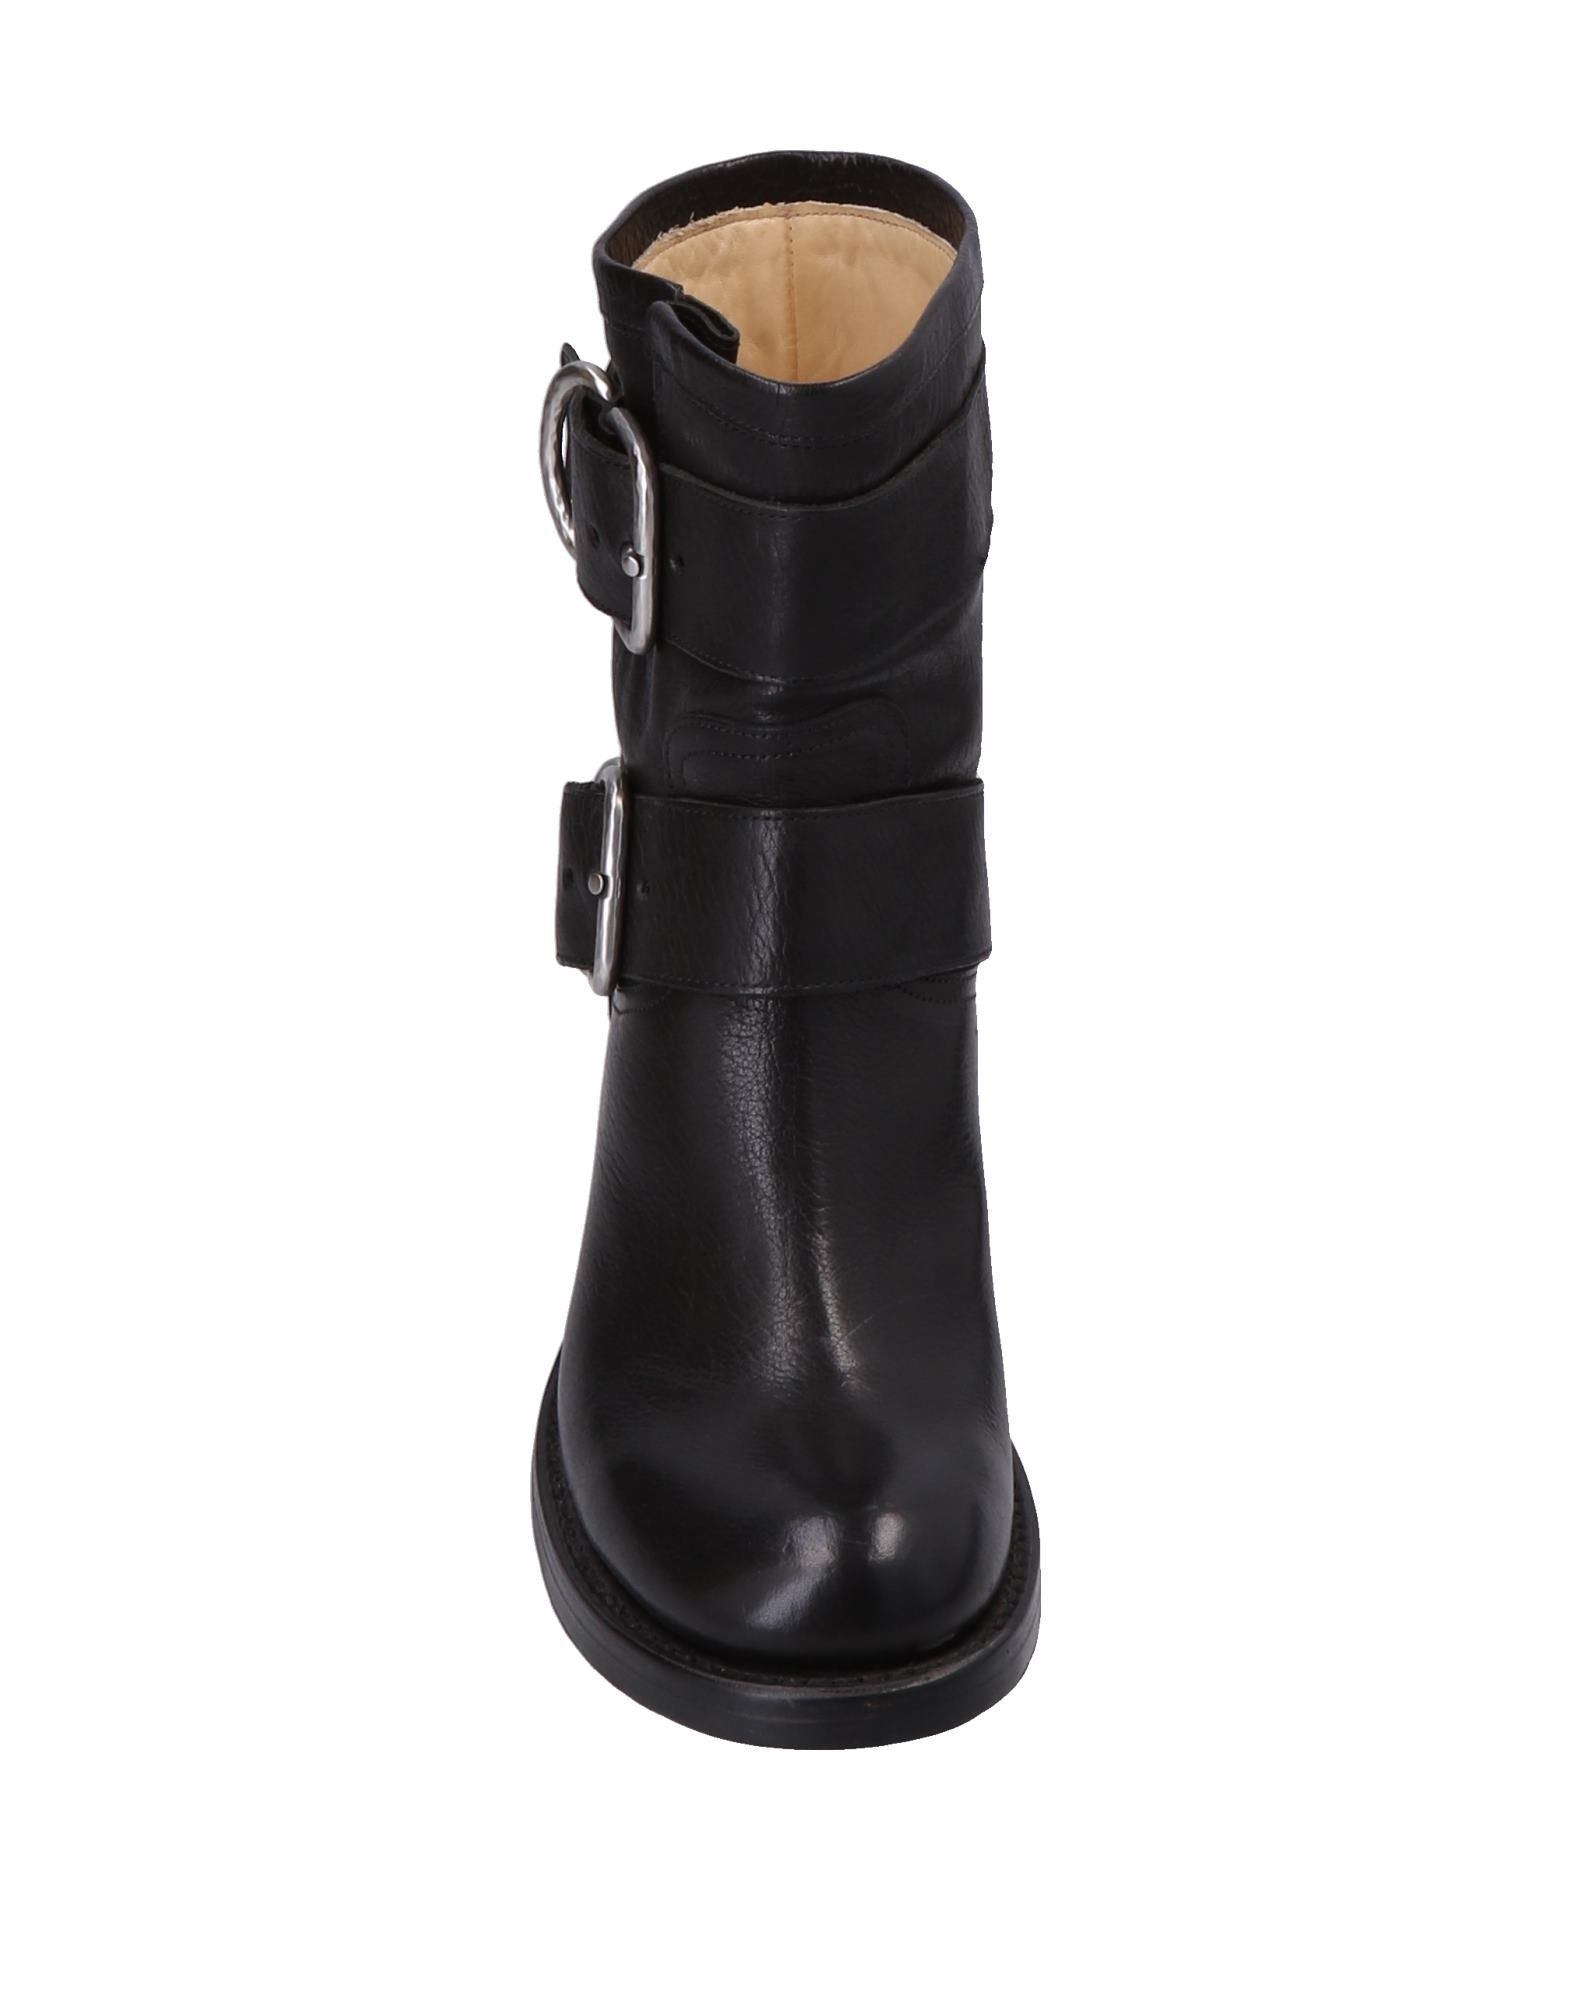 Free Lance Stiefelette Damen  11527165KKGünstige aussehende gut aussehende 11527165KKGünstige Schuhe f59f20